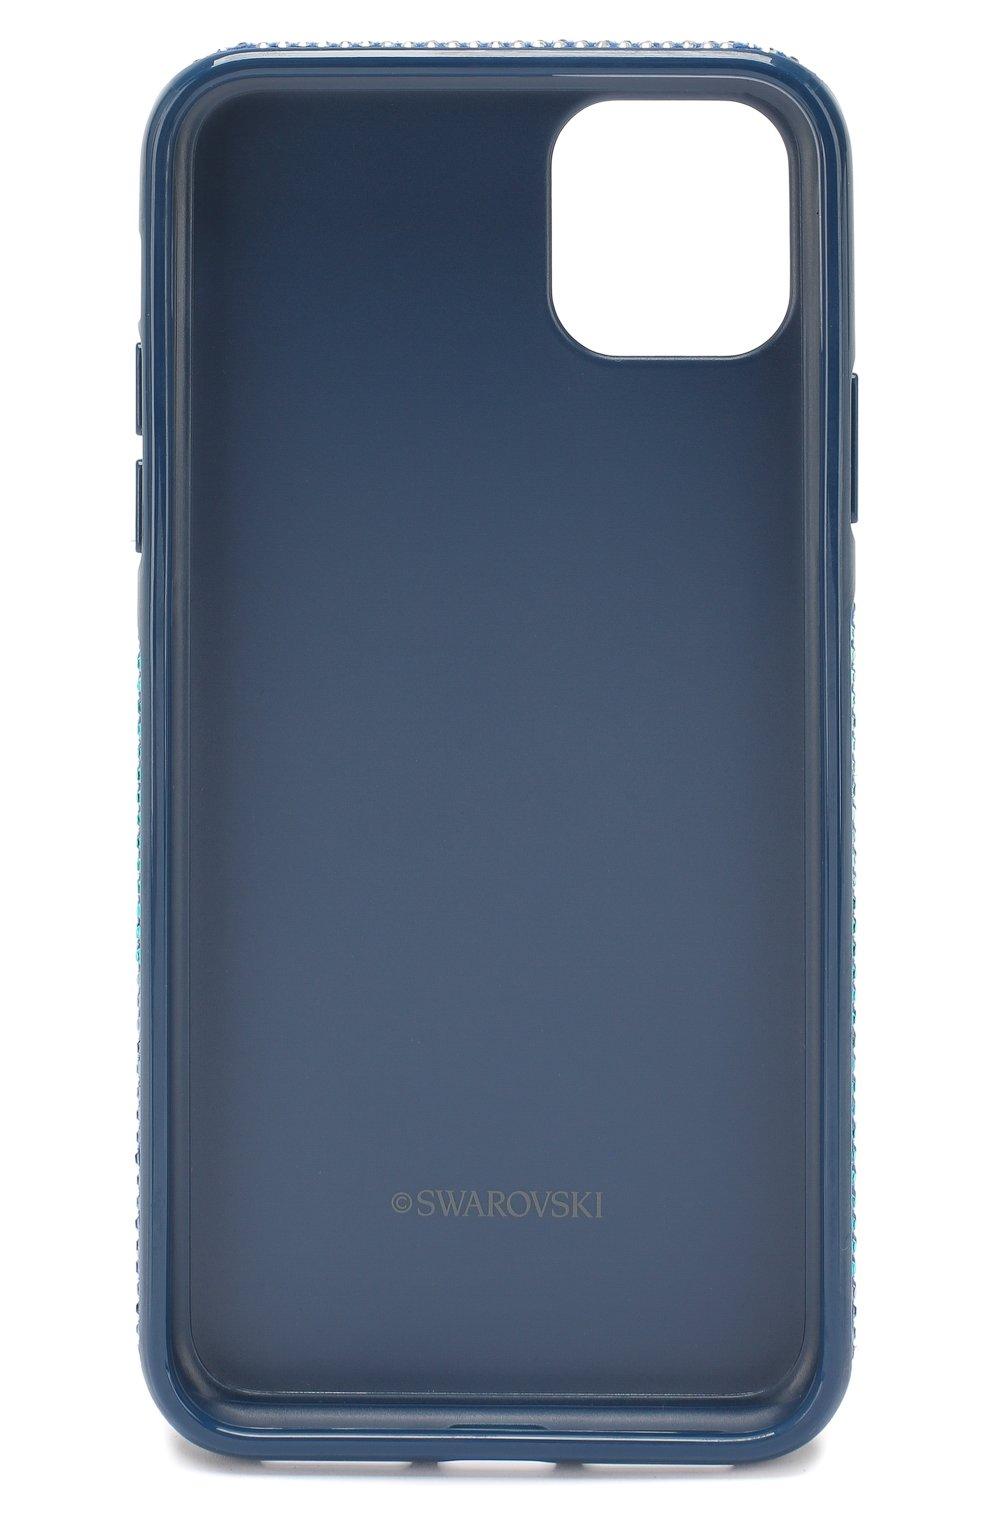 Мужской чехол для iphone 11 pro max SWAROVSKI синего цвета, арт. 5533965   Фото 2